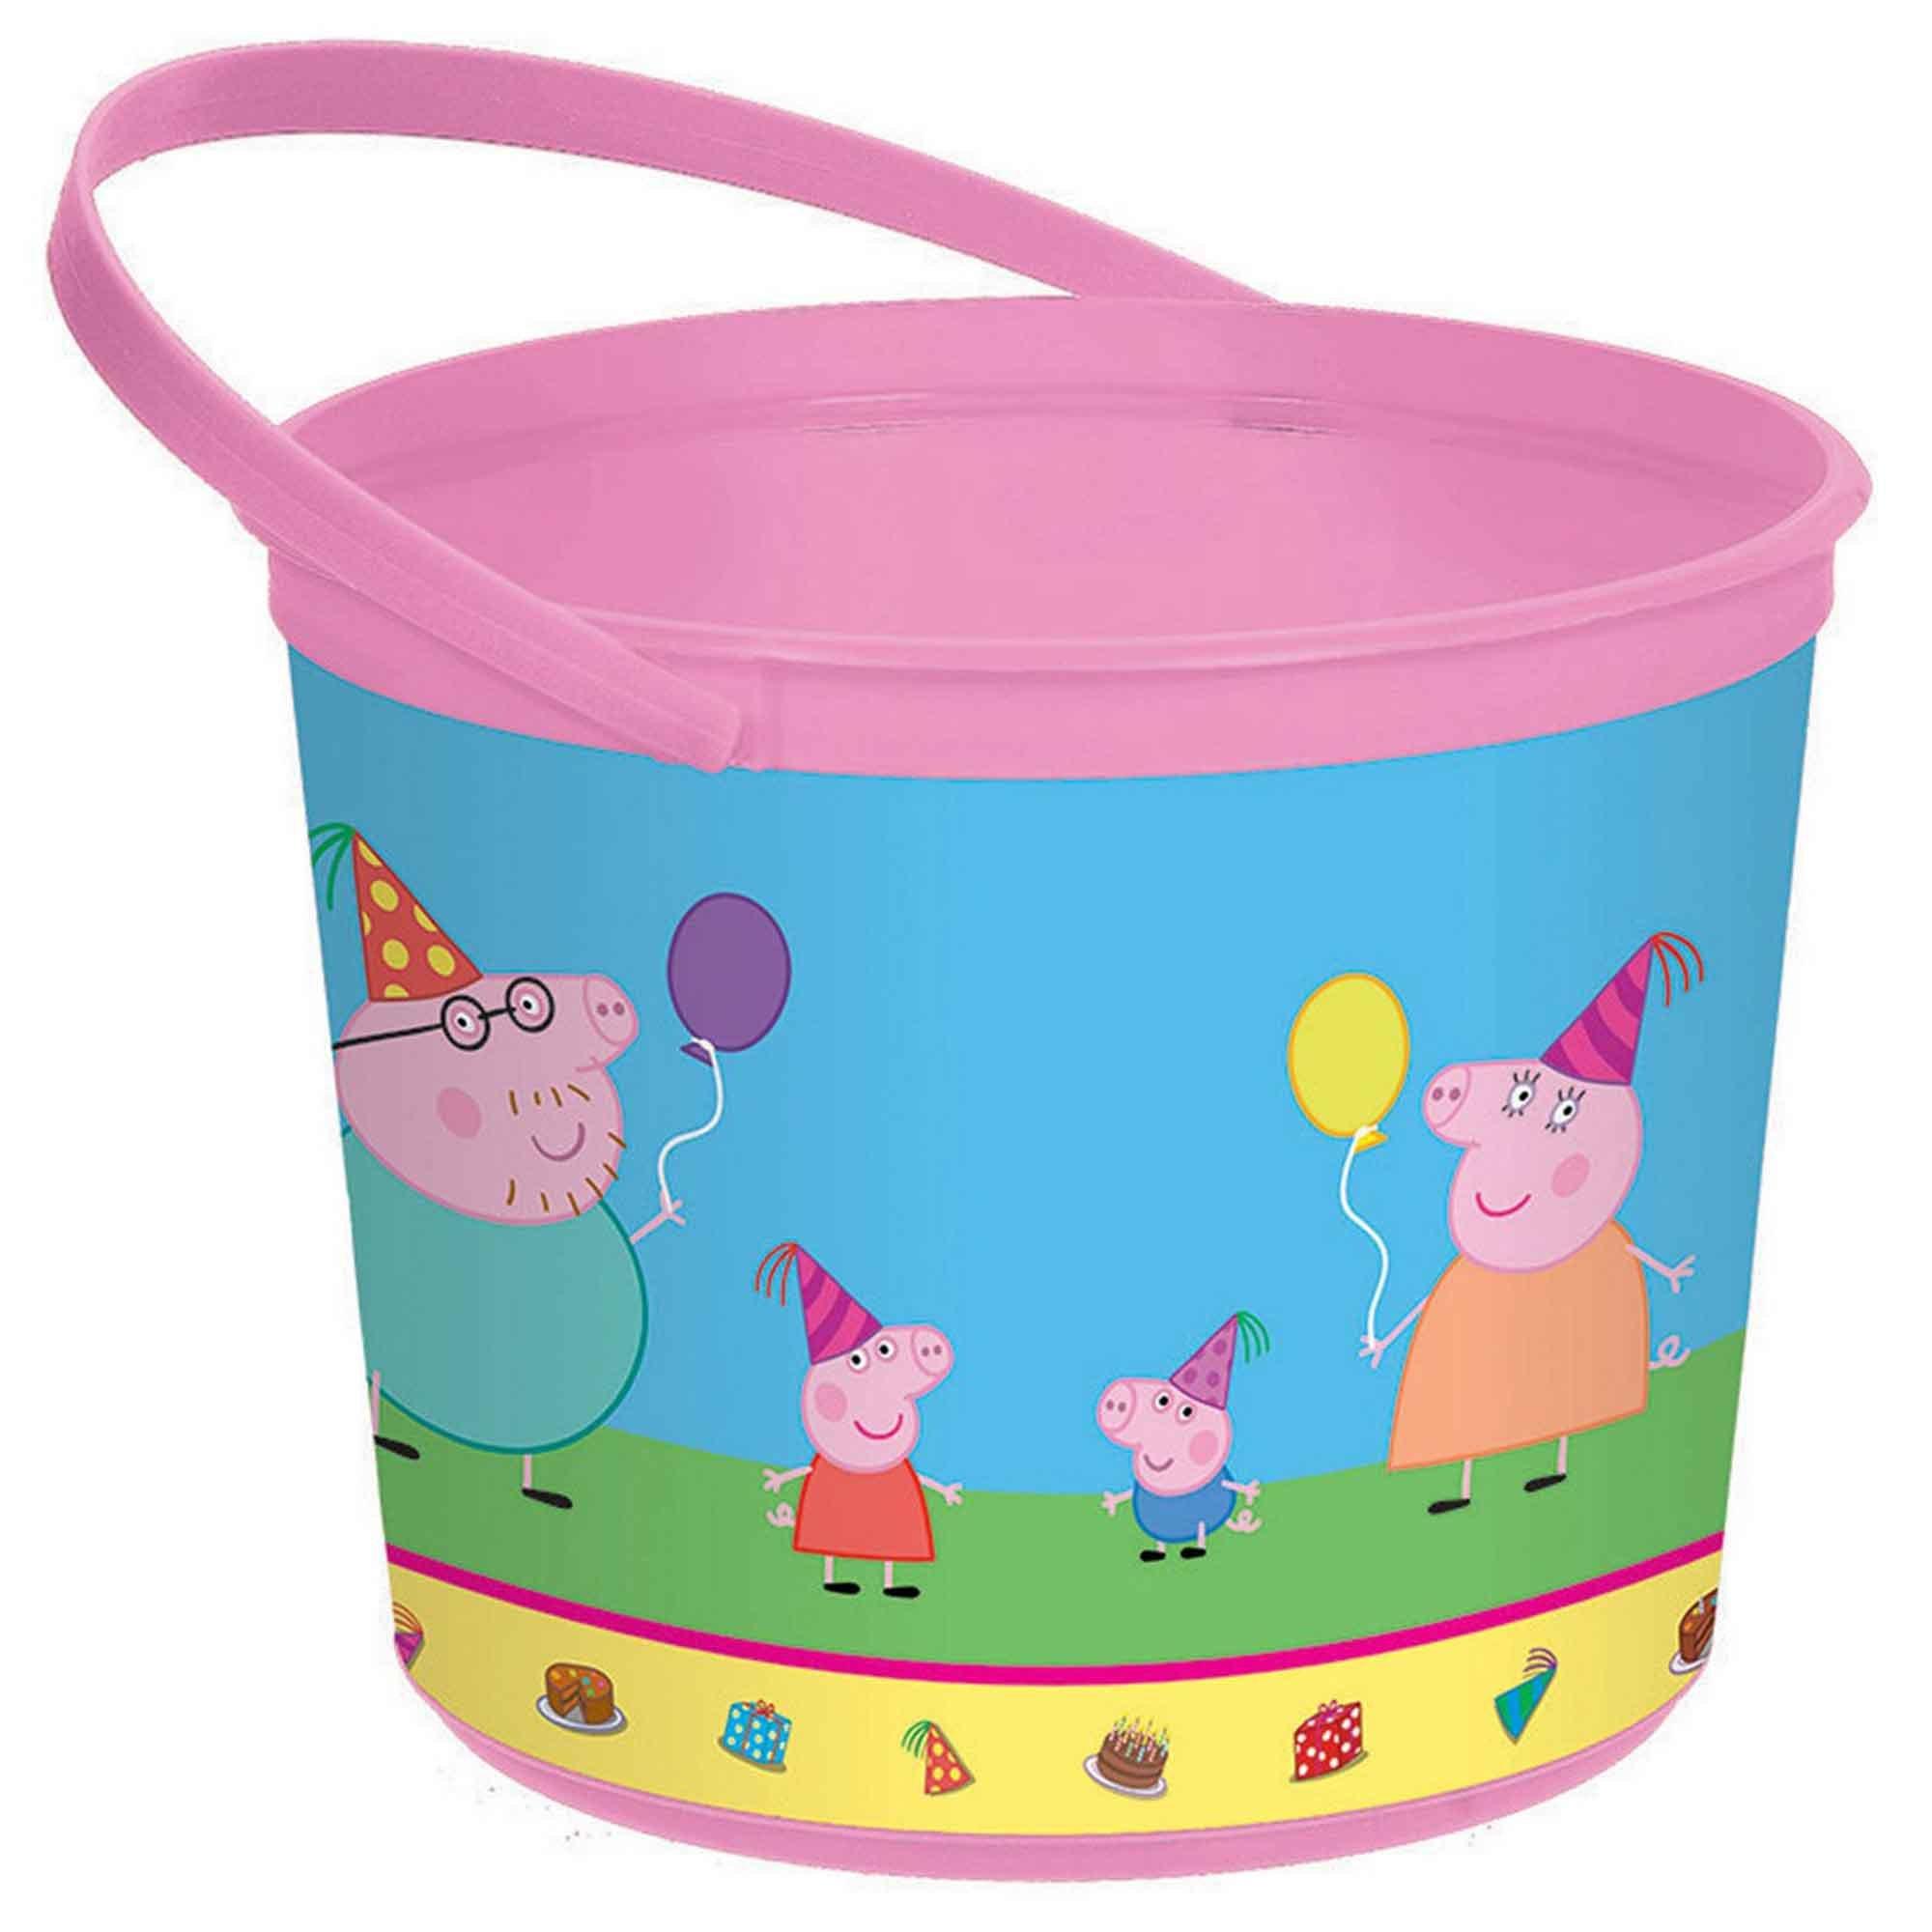 Peppa Pig Favor Container - Plastic